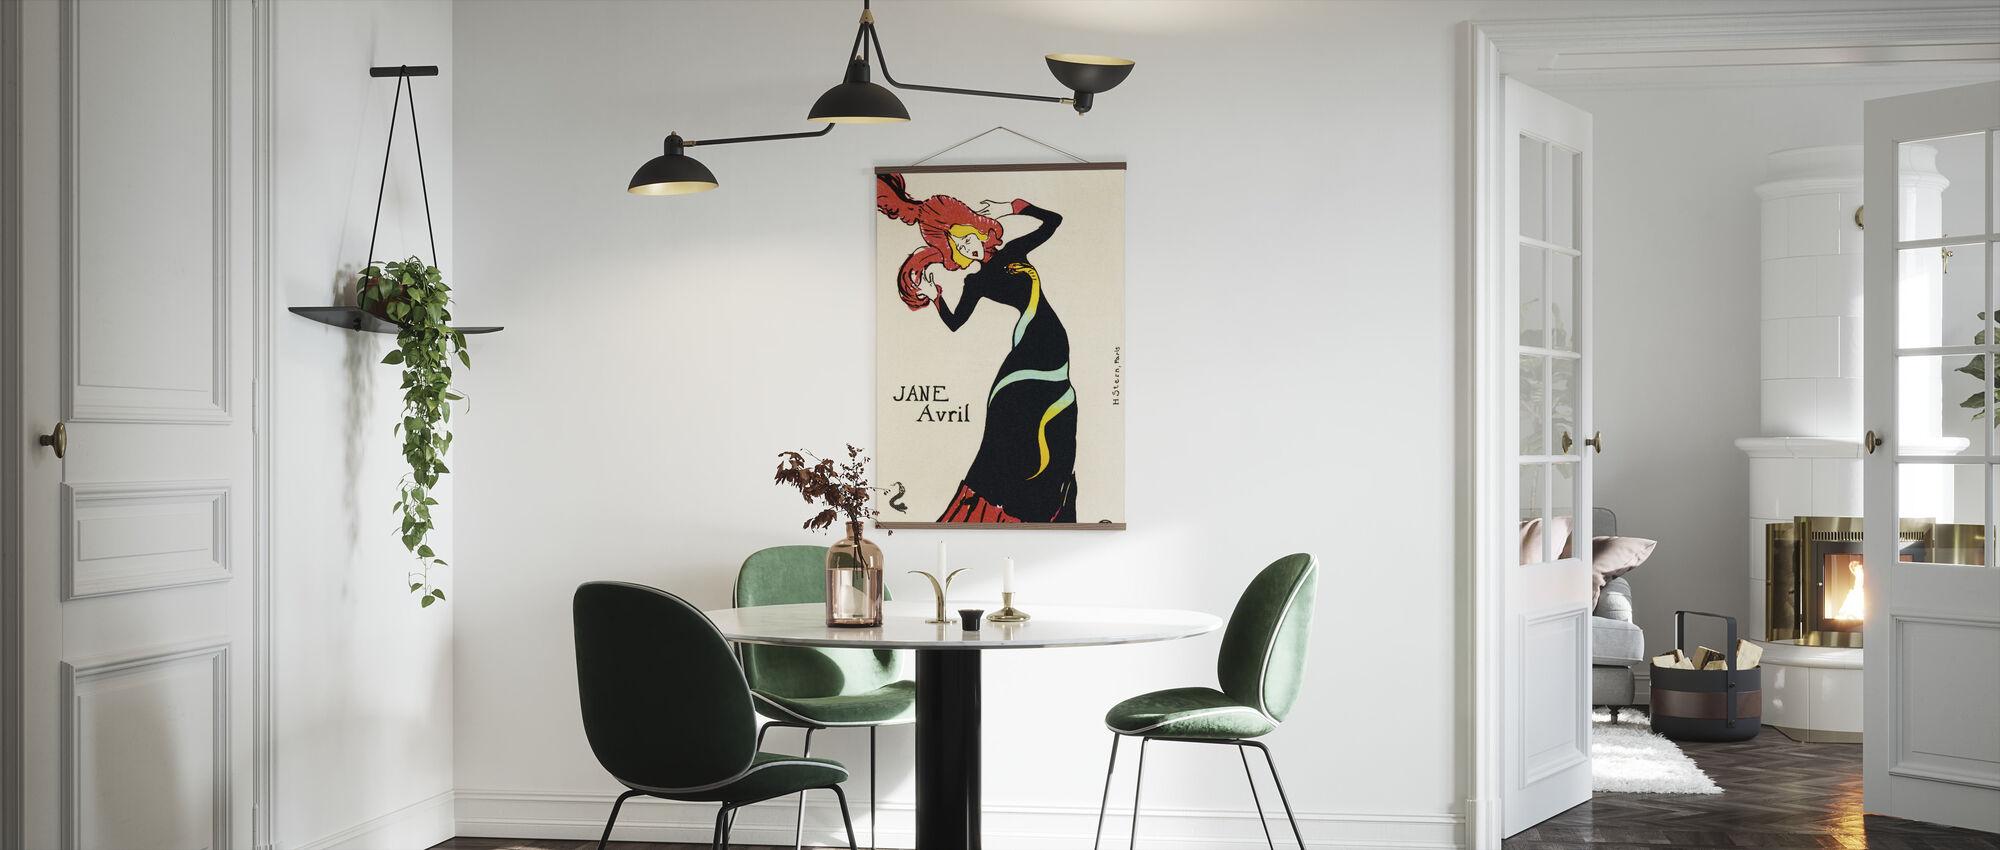 Jane Avril, Henri Toulouse Lautrec - Poster - Kitchen